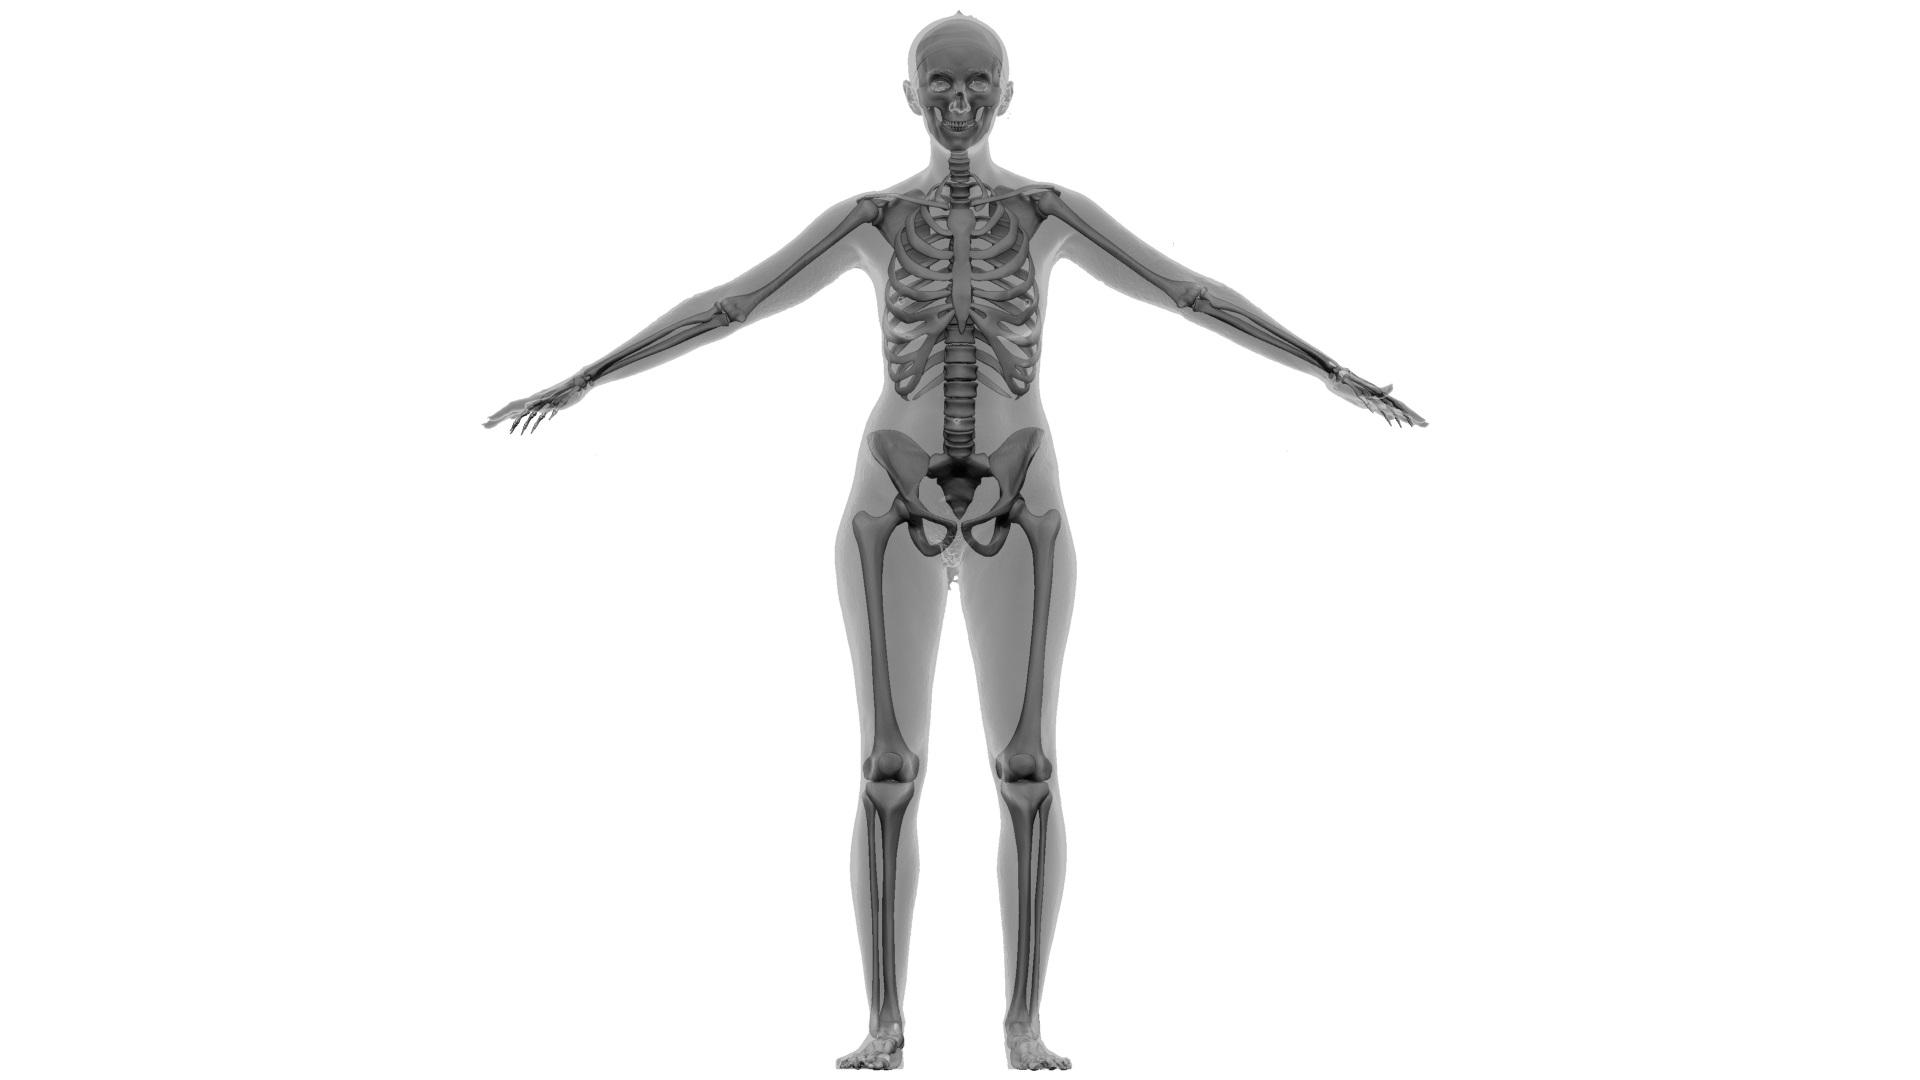 Ian_Nakamoto_Mel_Keiser_Skeleton_render